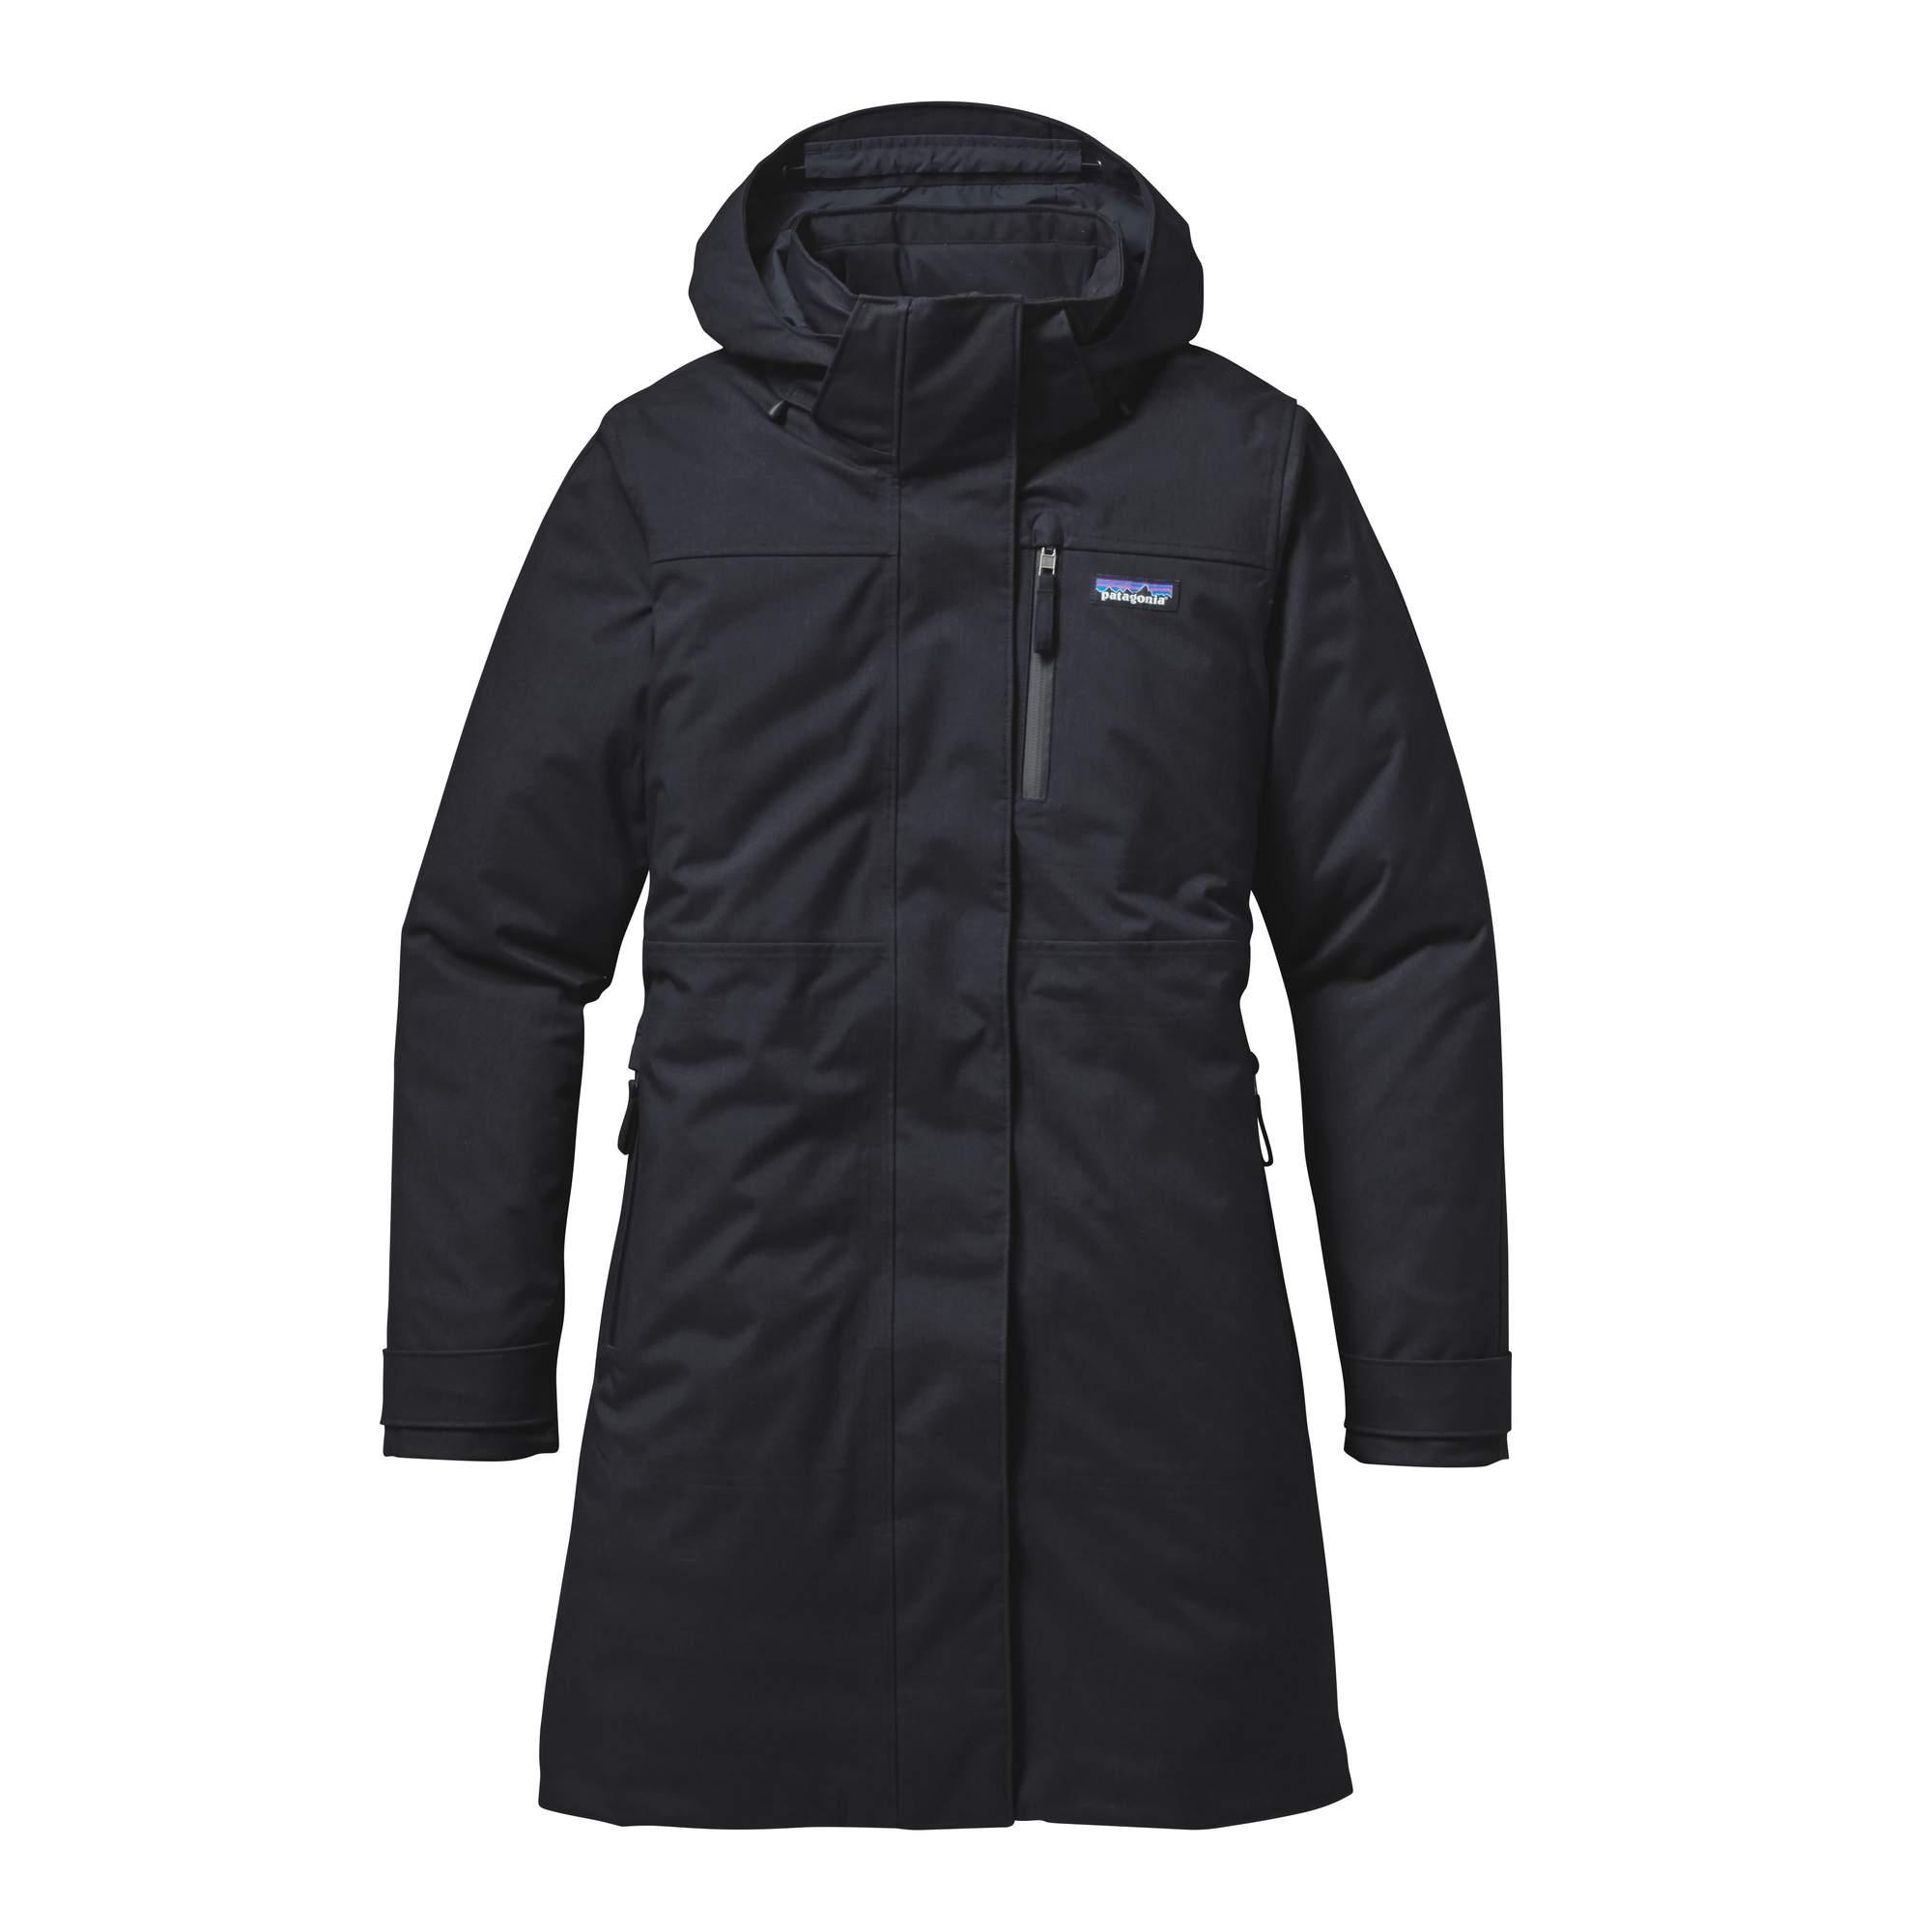 Patagonia Stormdrift Parka Damen Gr. XL - schwarz / black - Wintermäntel